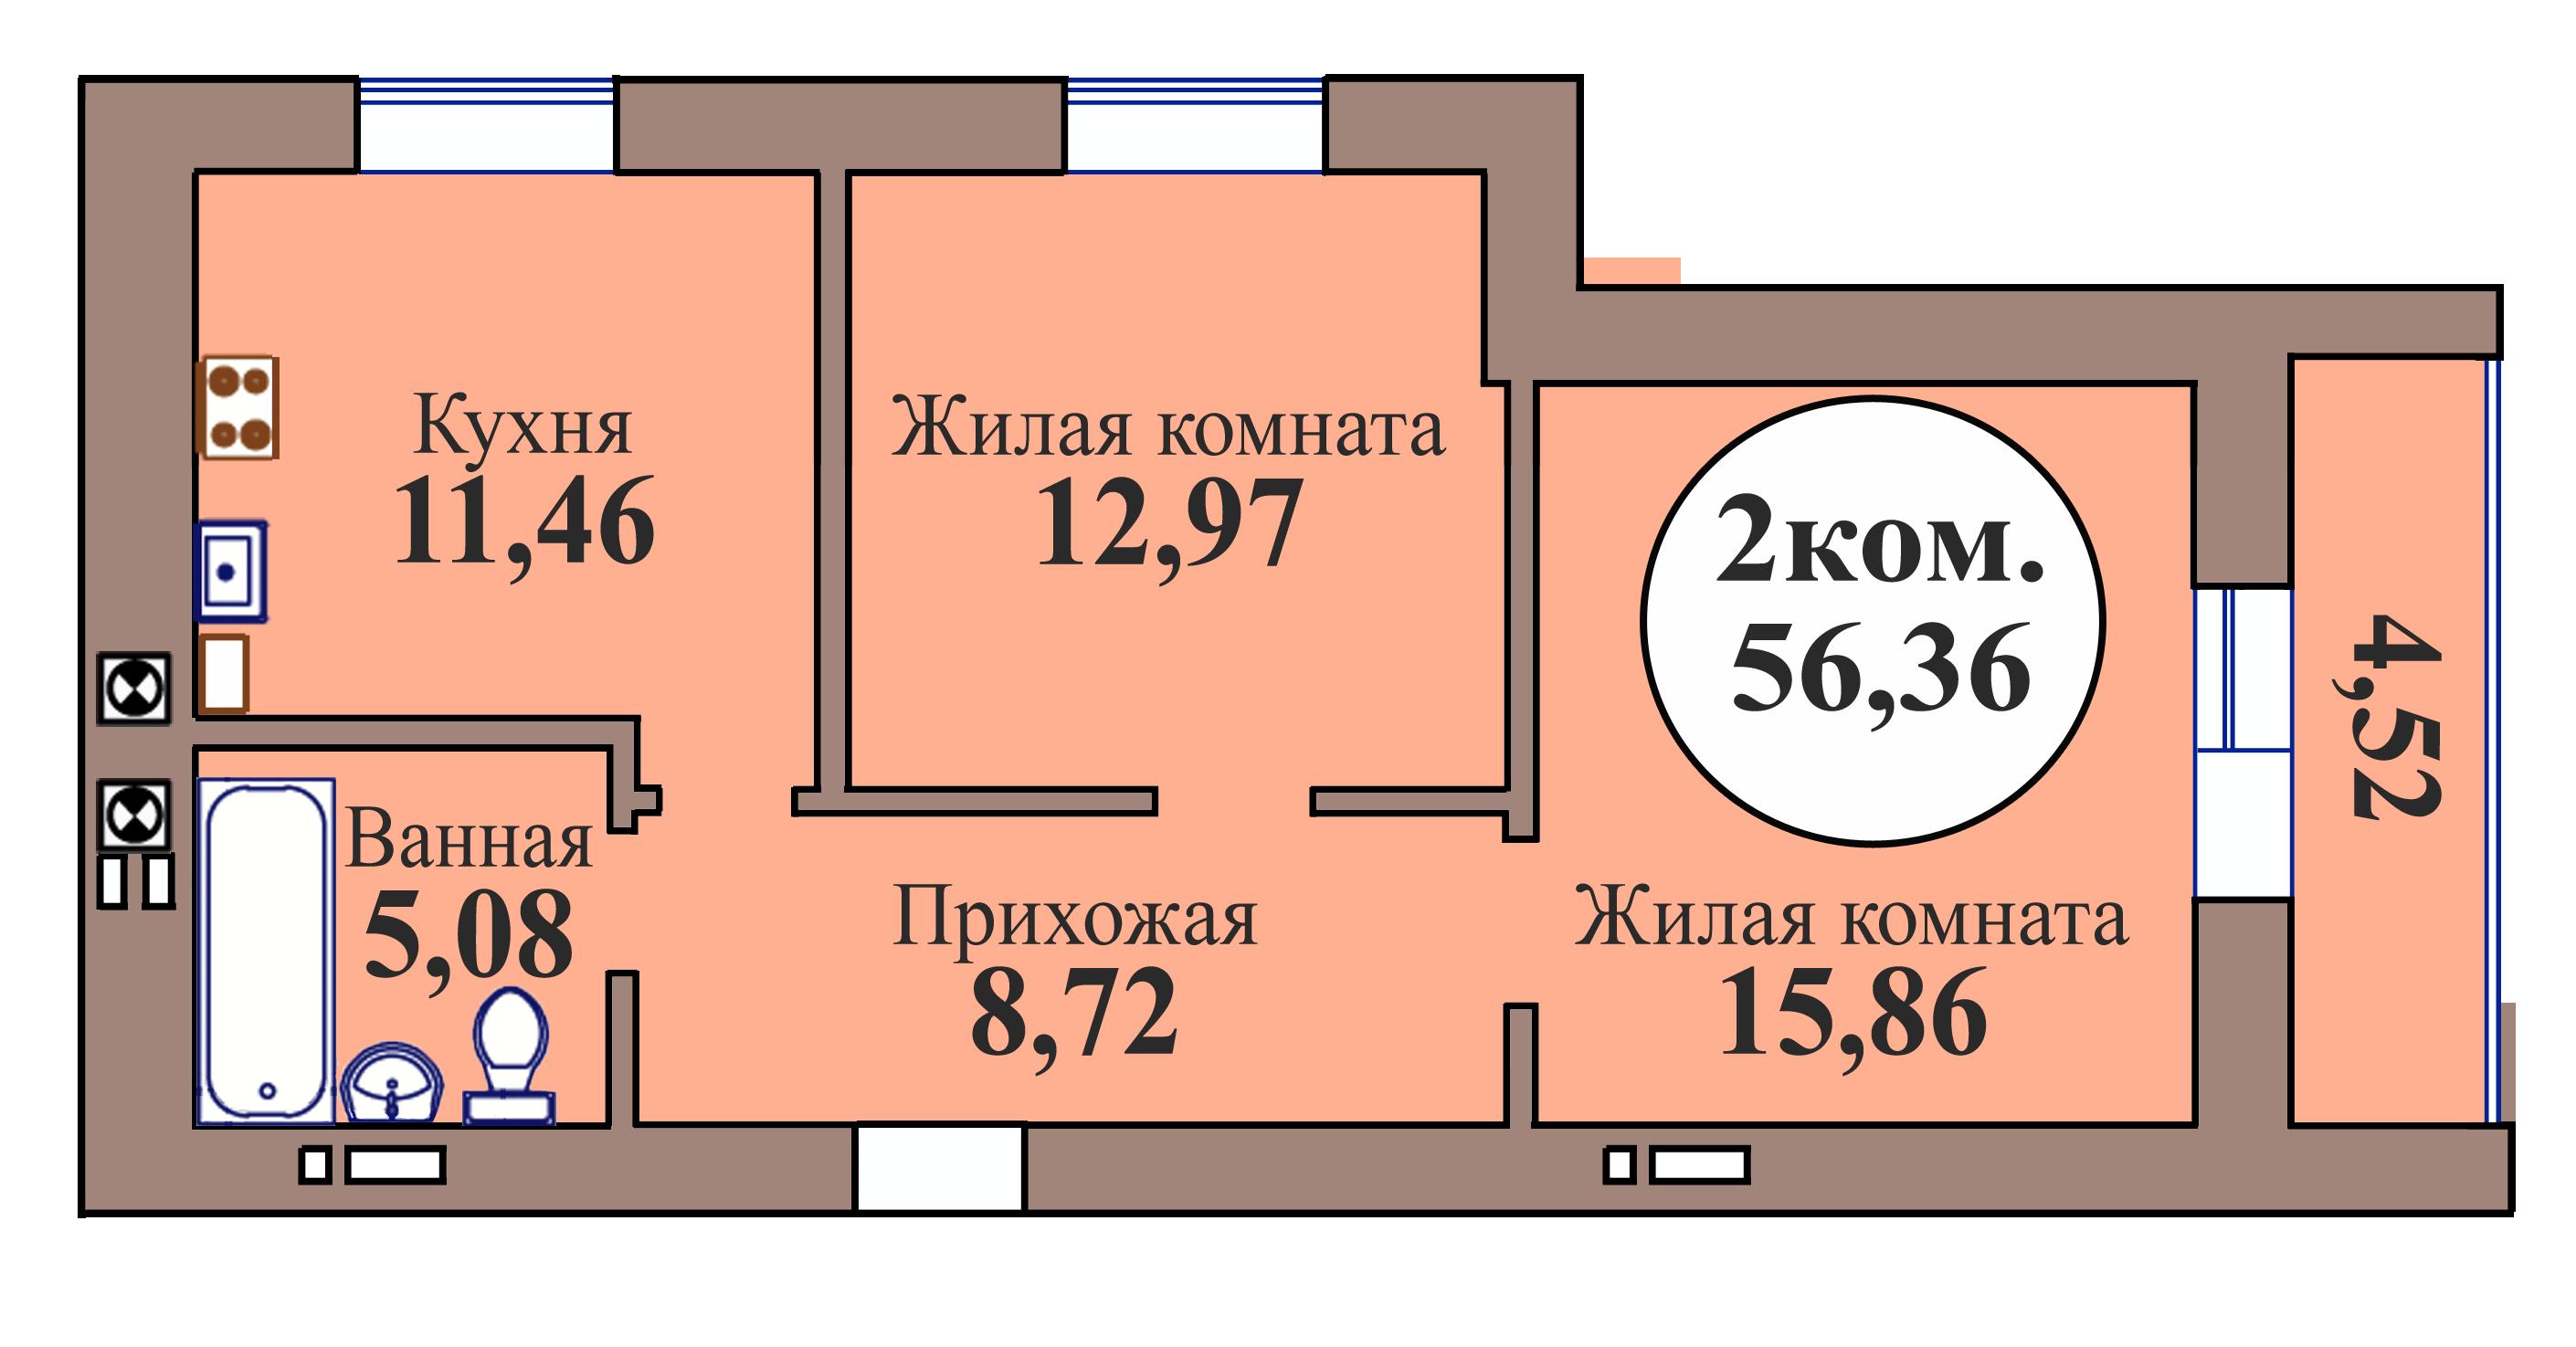 2-комн. кв. по ГП дом №3, МКР Васильково, кв. 128 в Калининграде